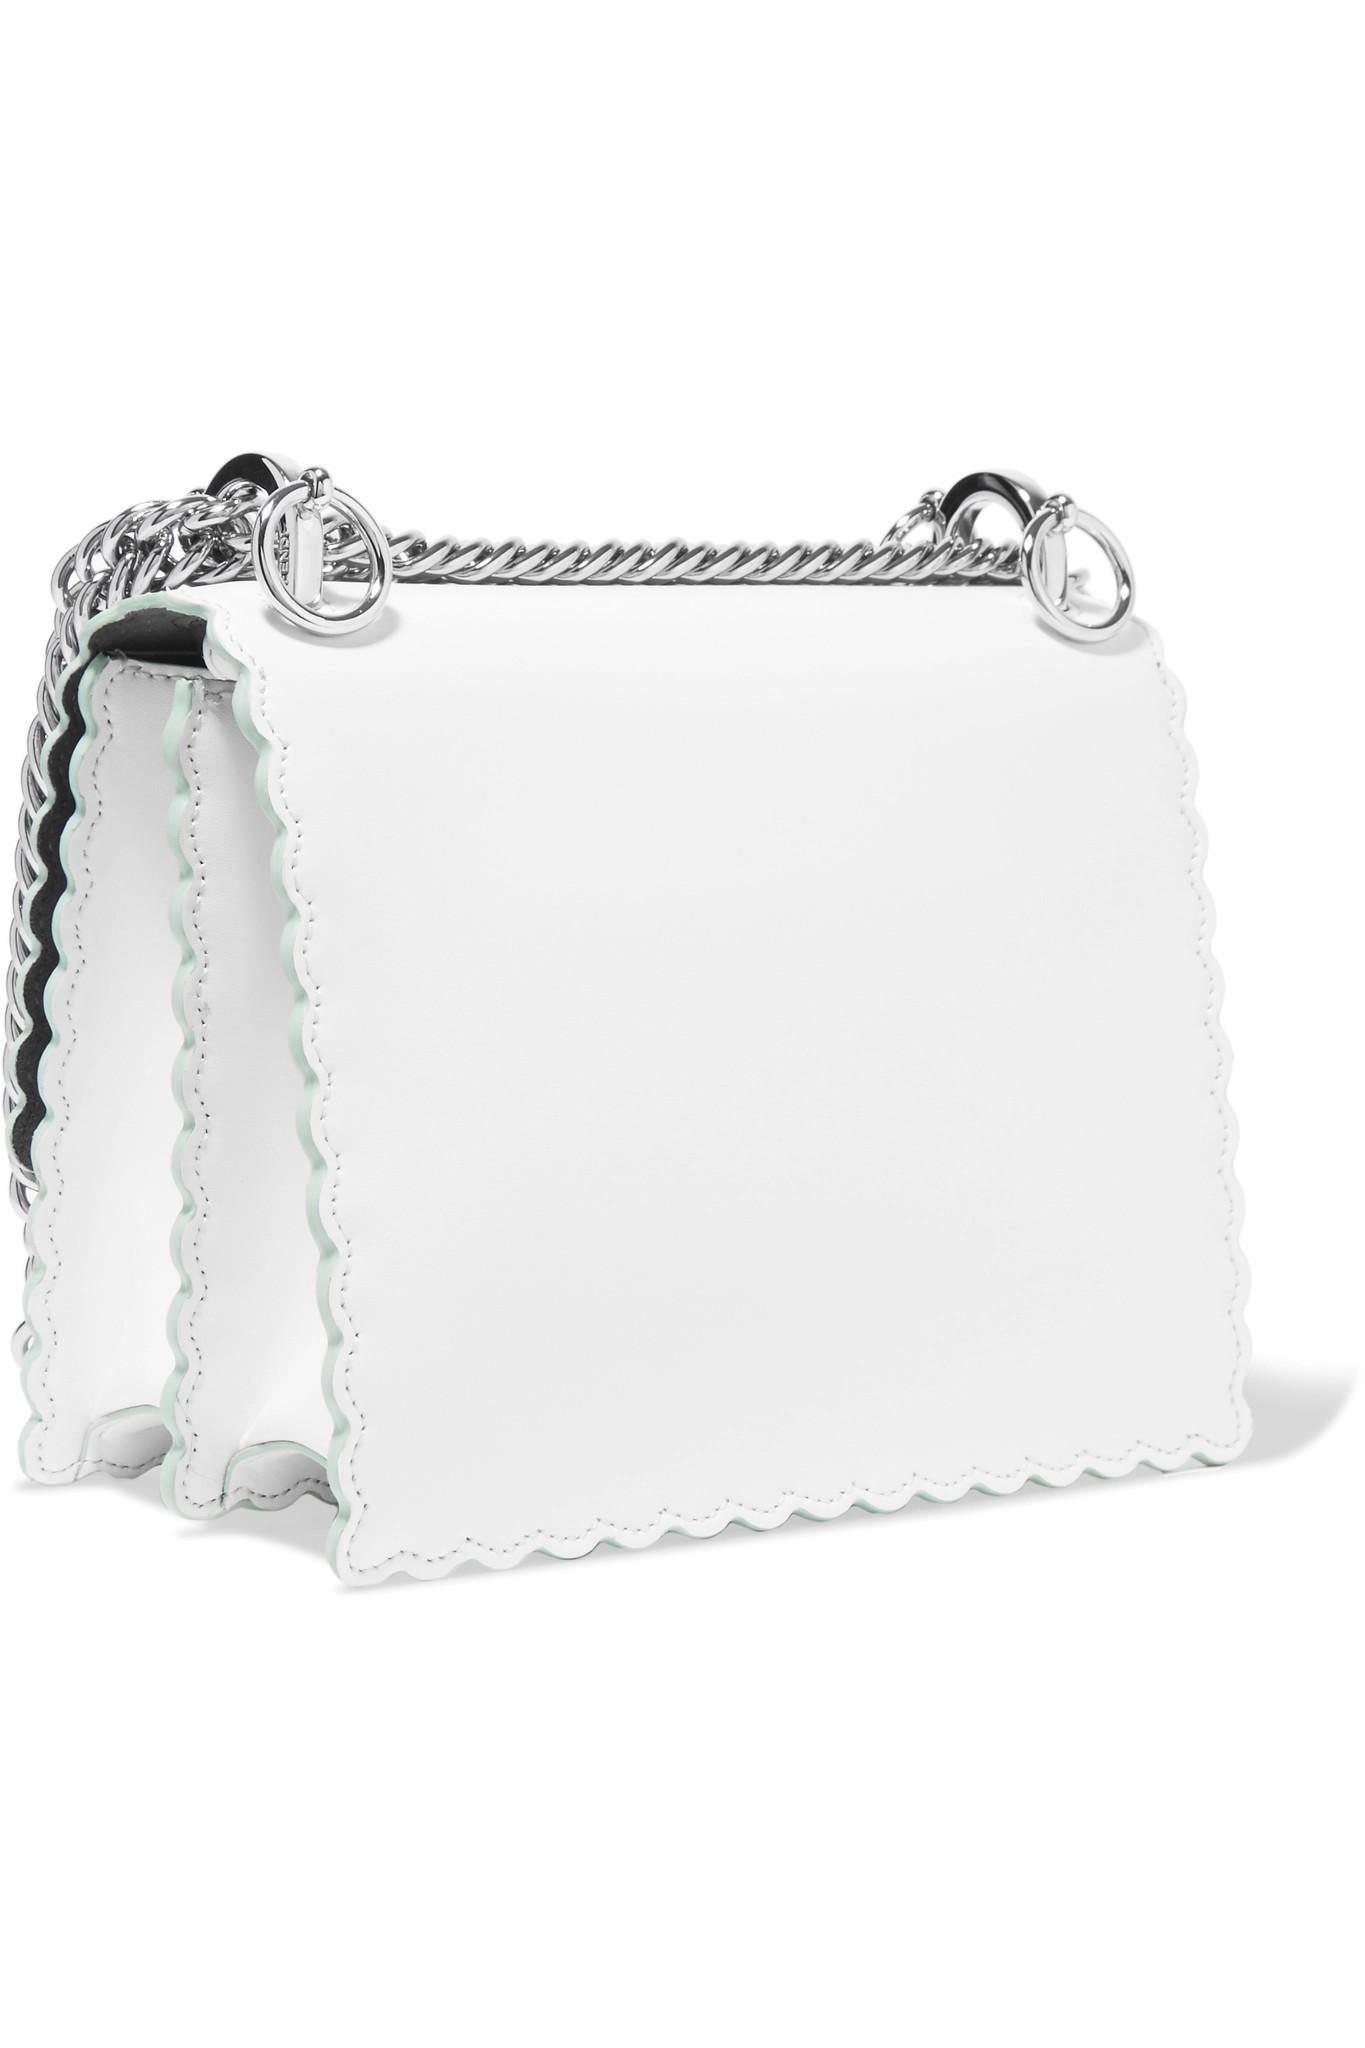 Lyst - Fendi Kan I Mini Leather Shoulder Bag in White 088e9ba60a4ed